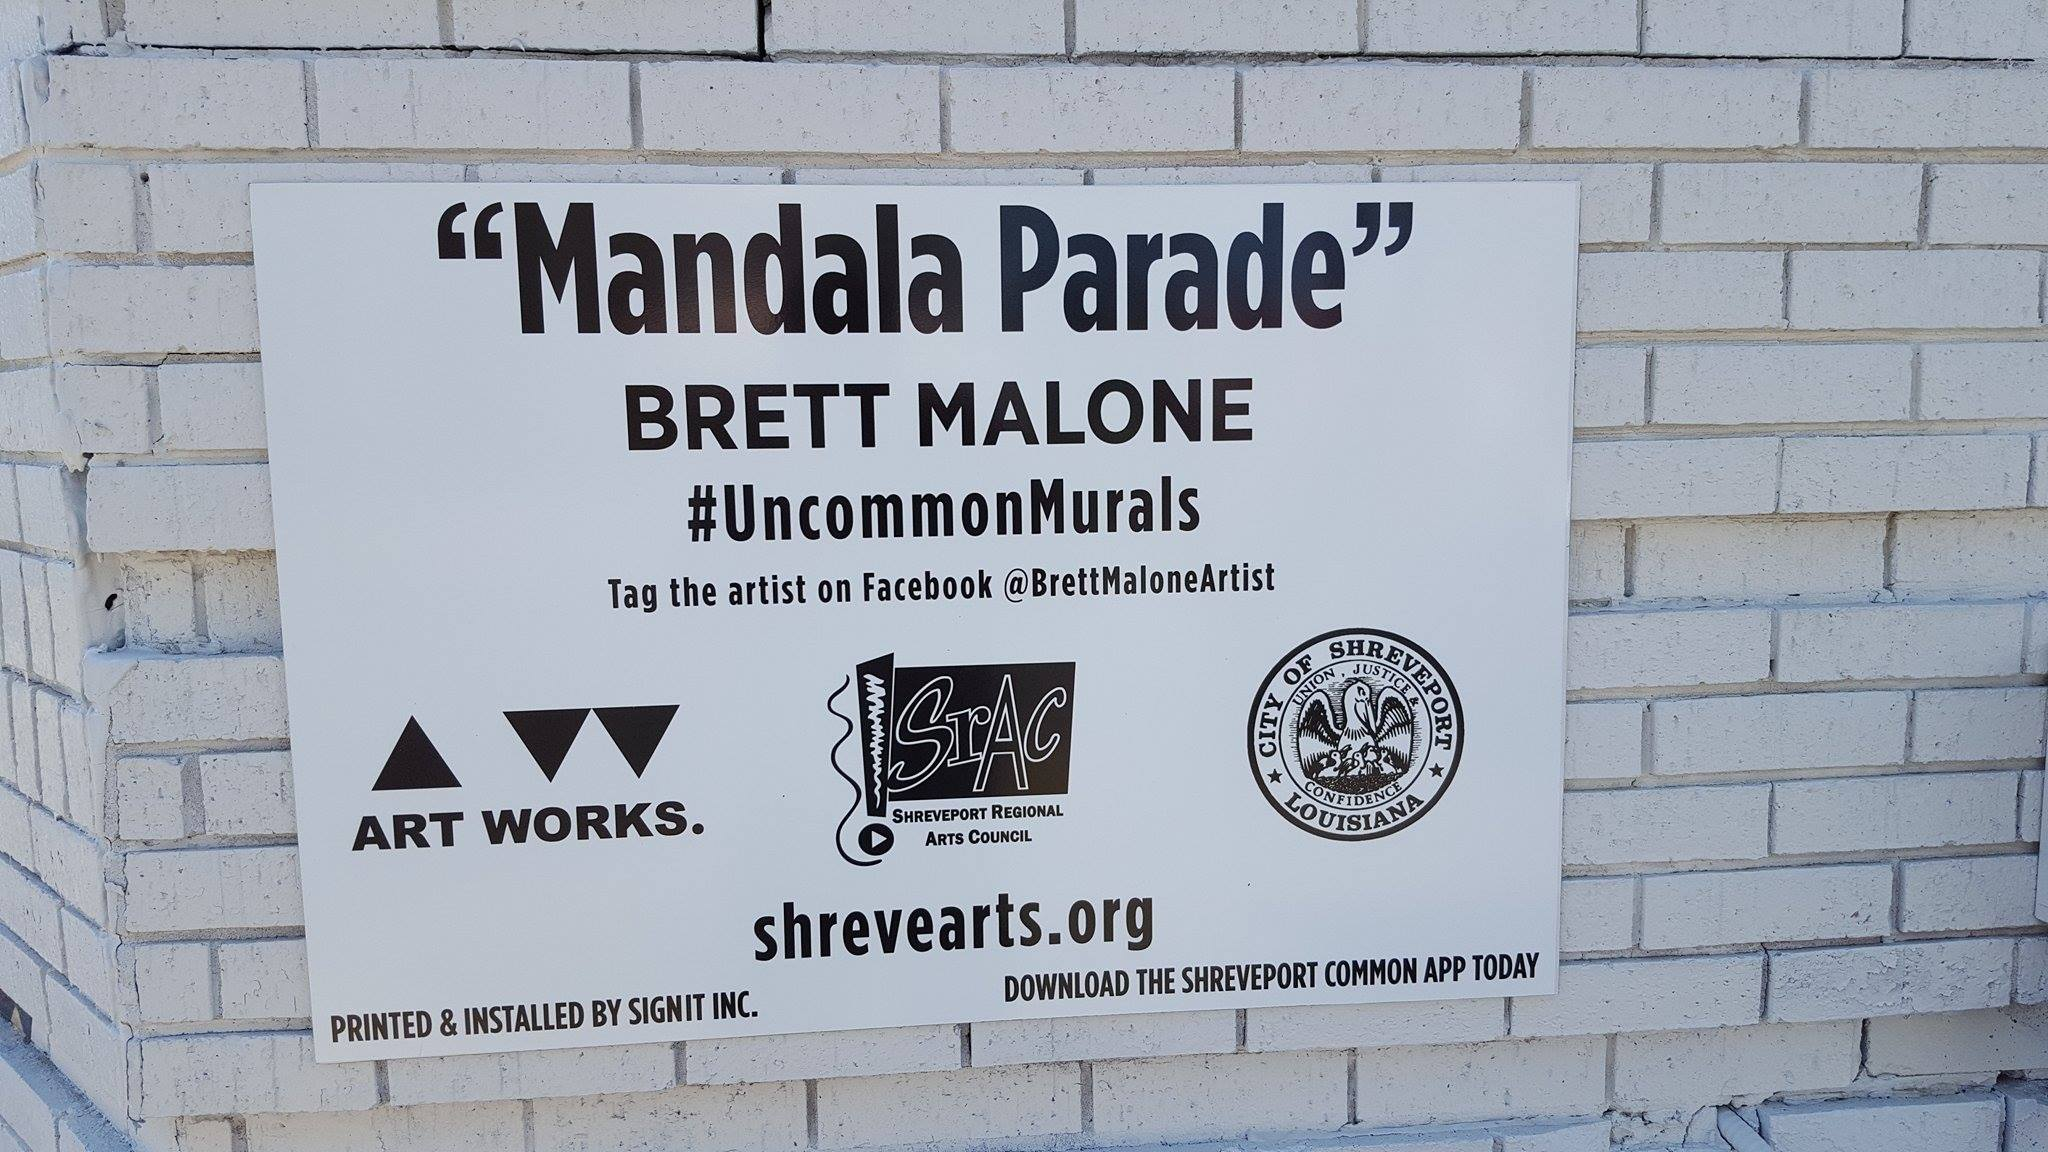 Mandala Parade